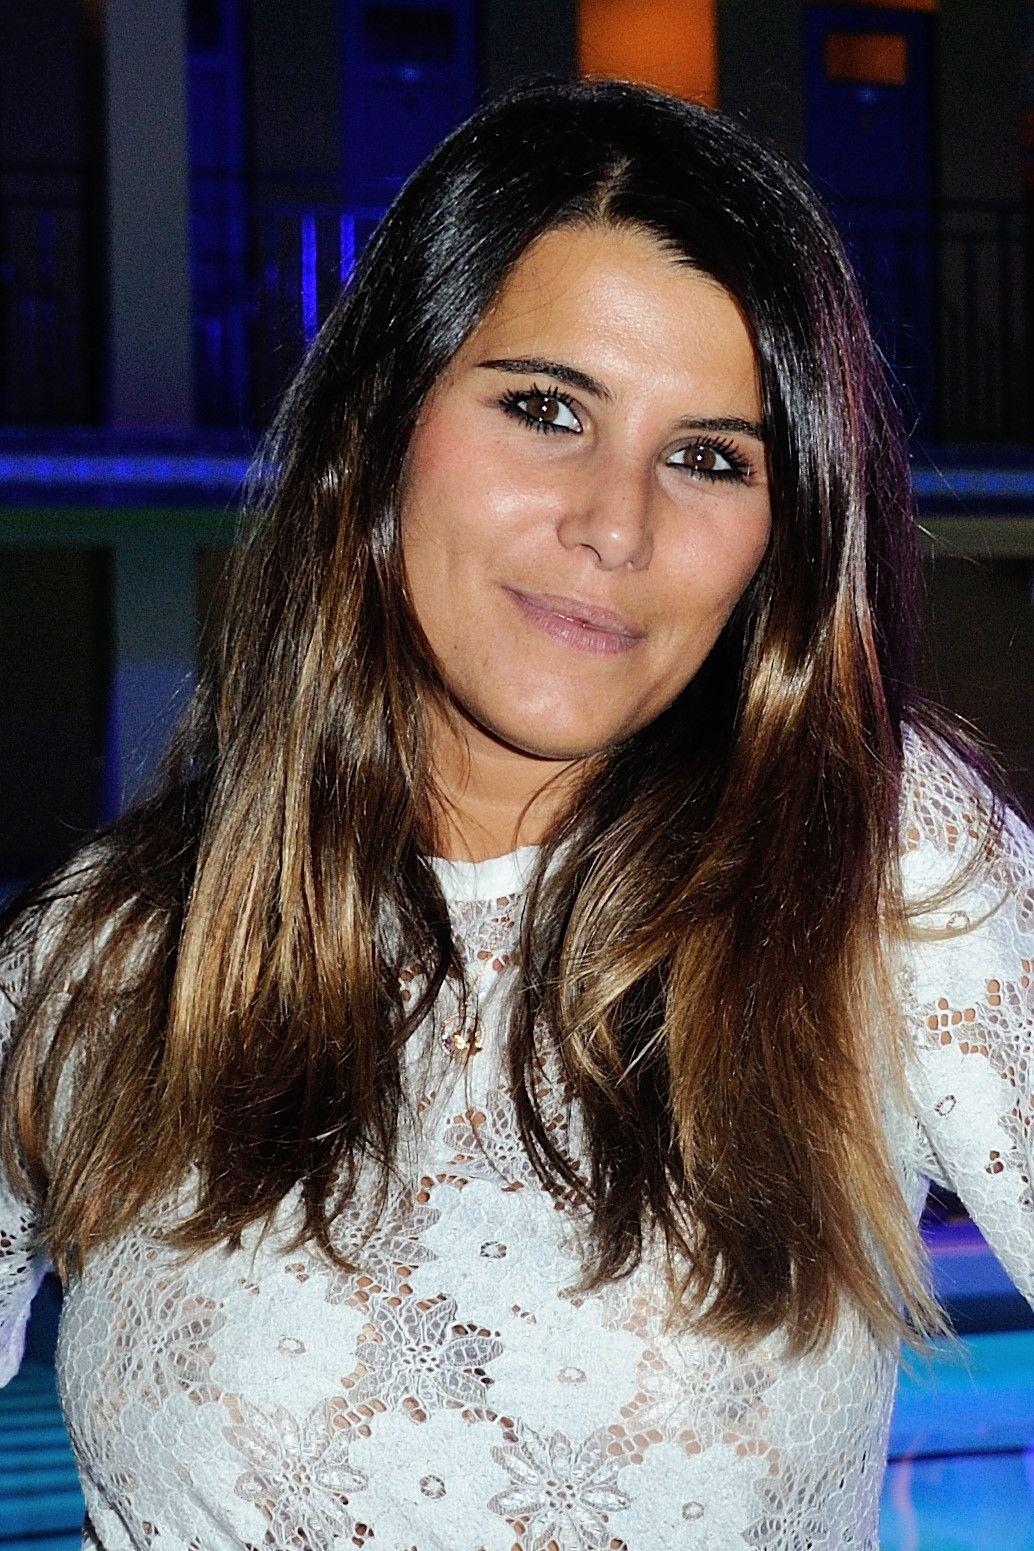 Robe karine ferri the voice 2018 \u2013 Meilleures robes France 2018